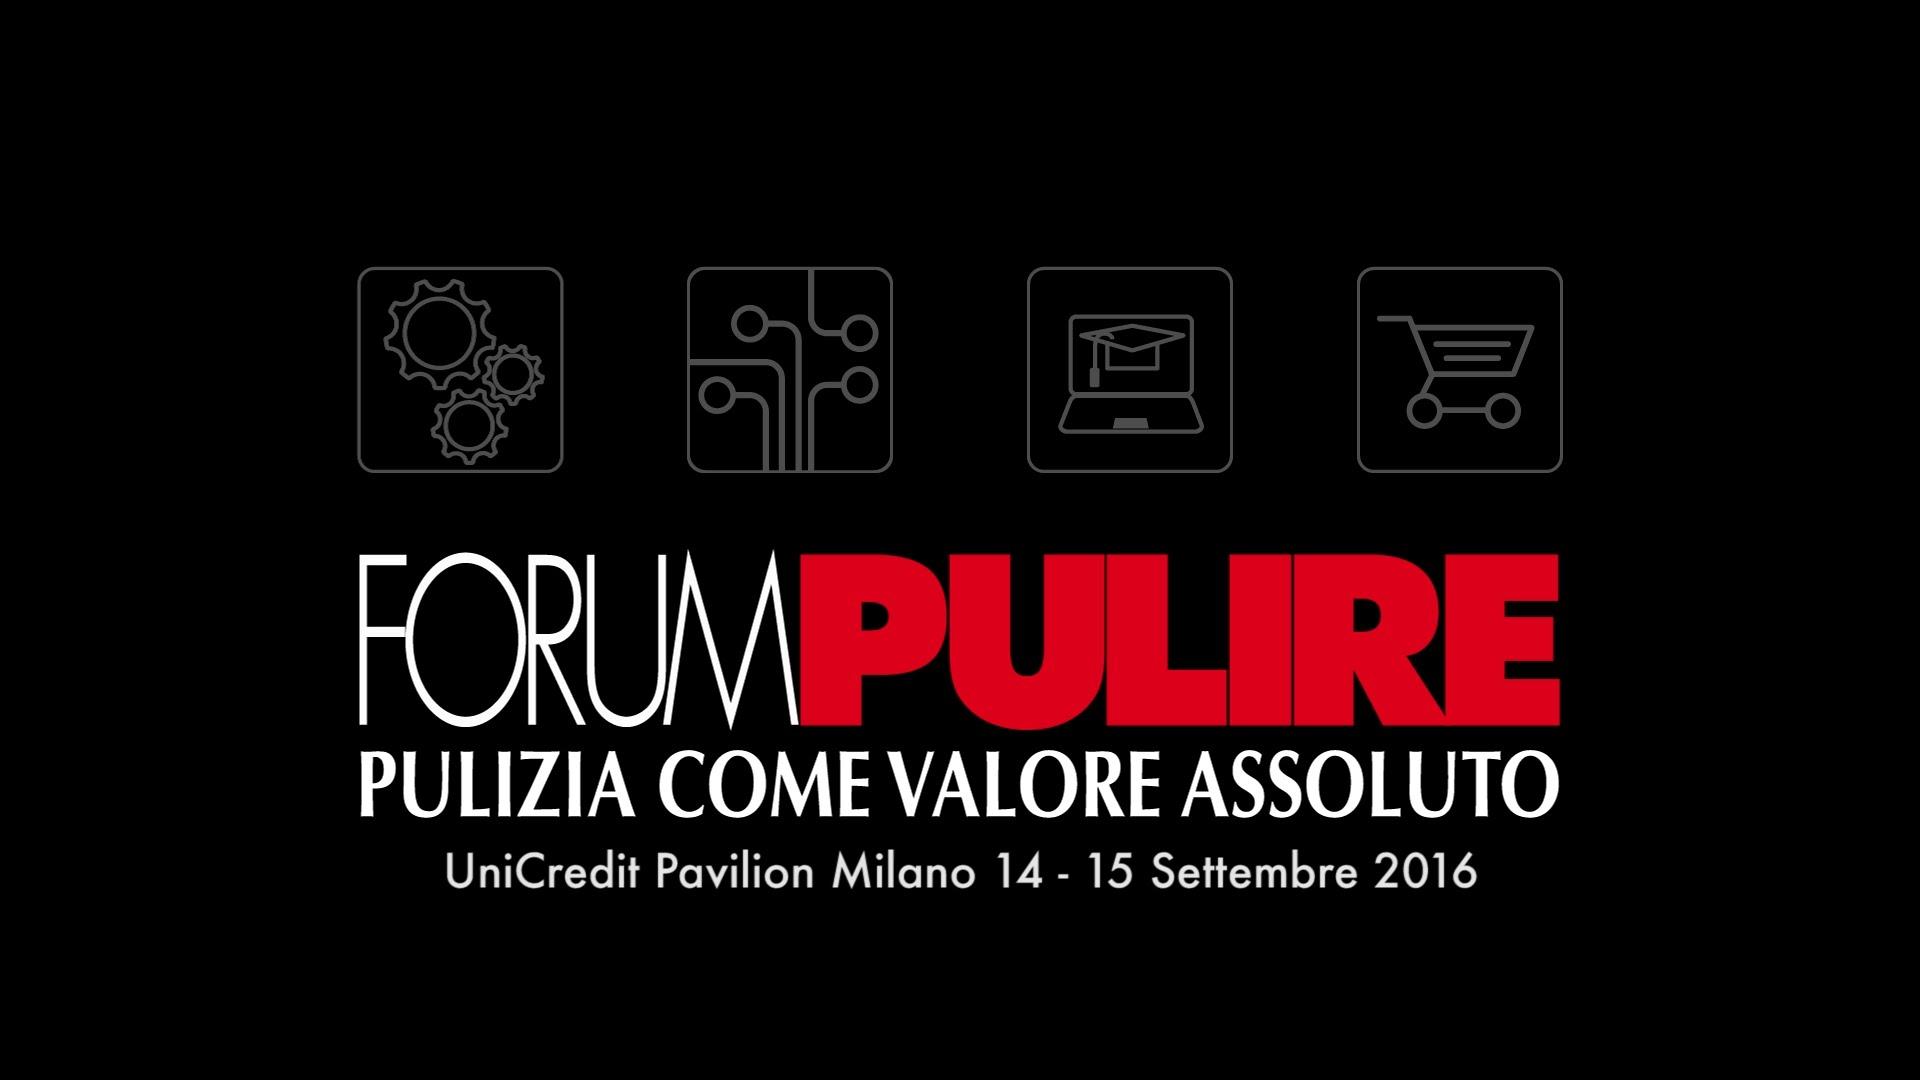 Forum Pulire 2016